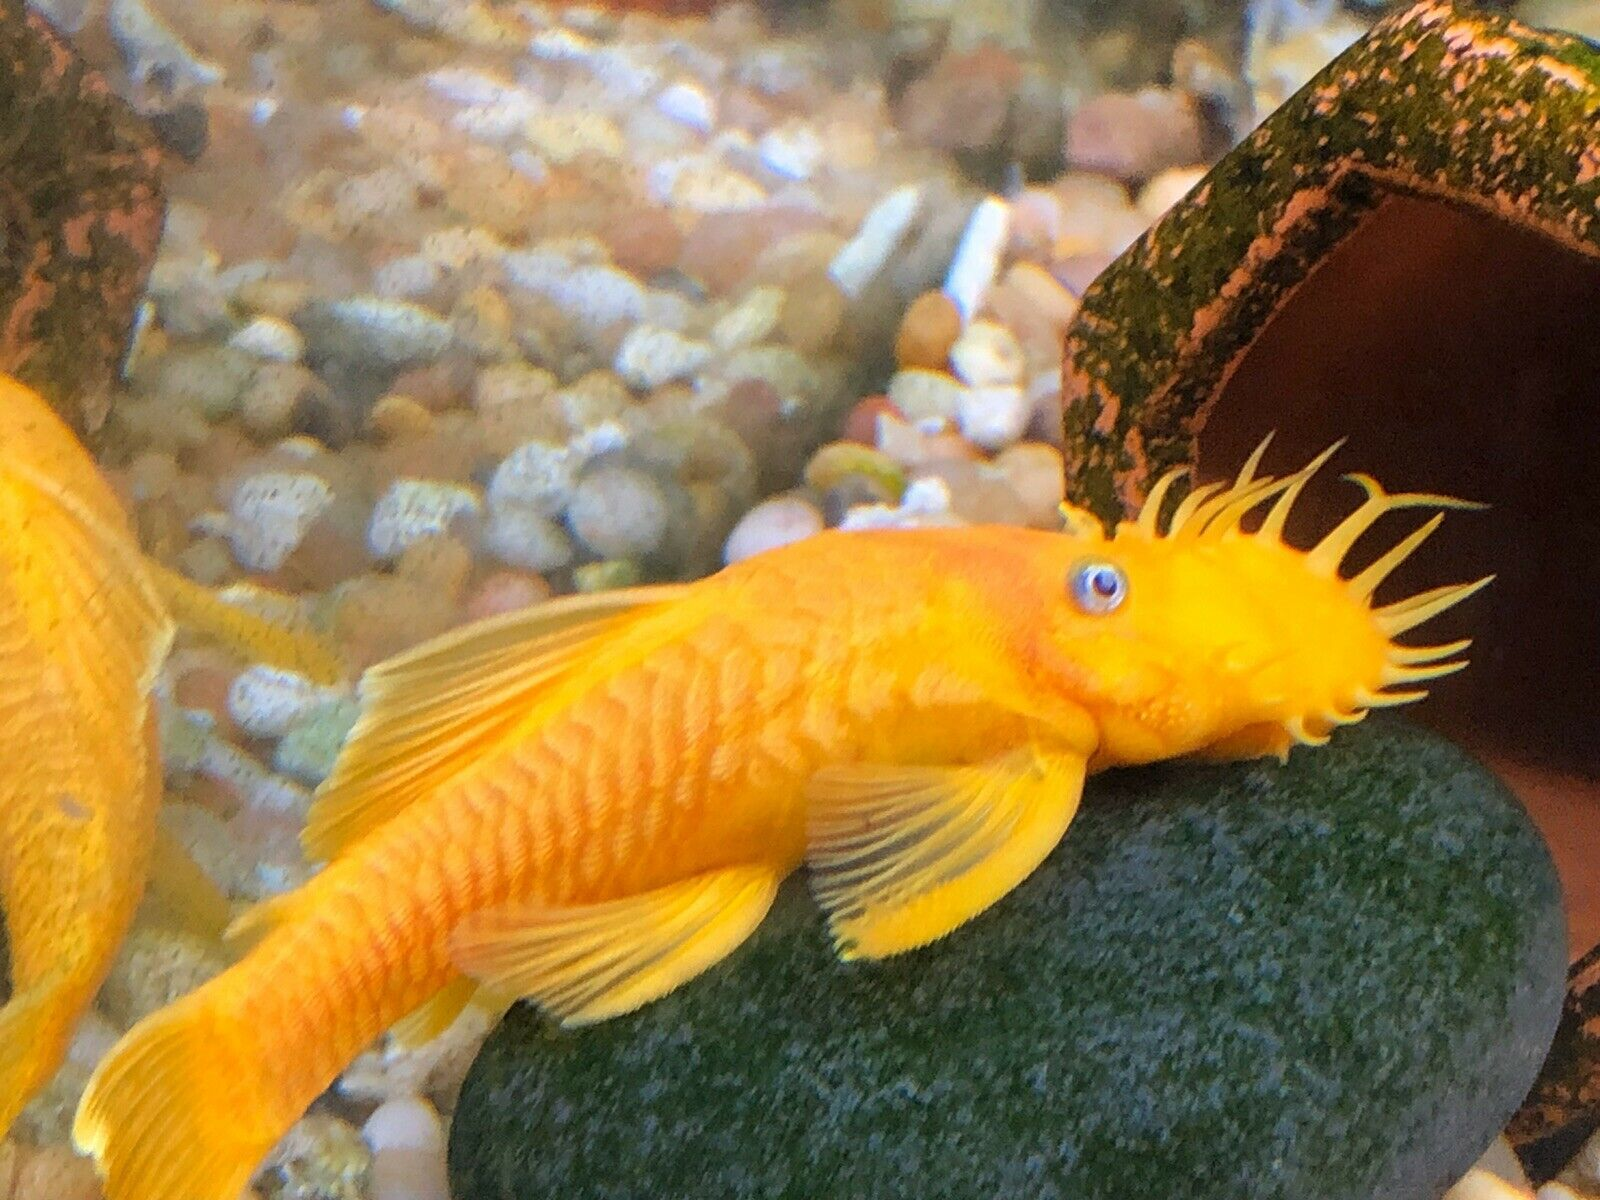 Guaranteed Pair 1 Male 1 Female L144 Blue Eye Lemon Bristlenose Pleco Ancistrus 15 00 Expedited Shipping Aquarium Fish For Sale Fish For Sale Beautiful Fish